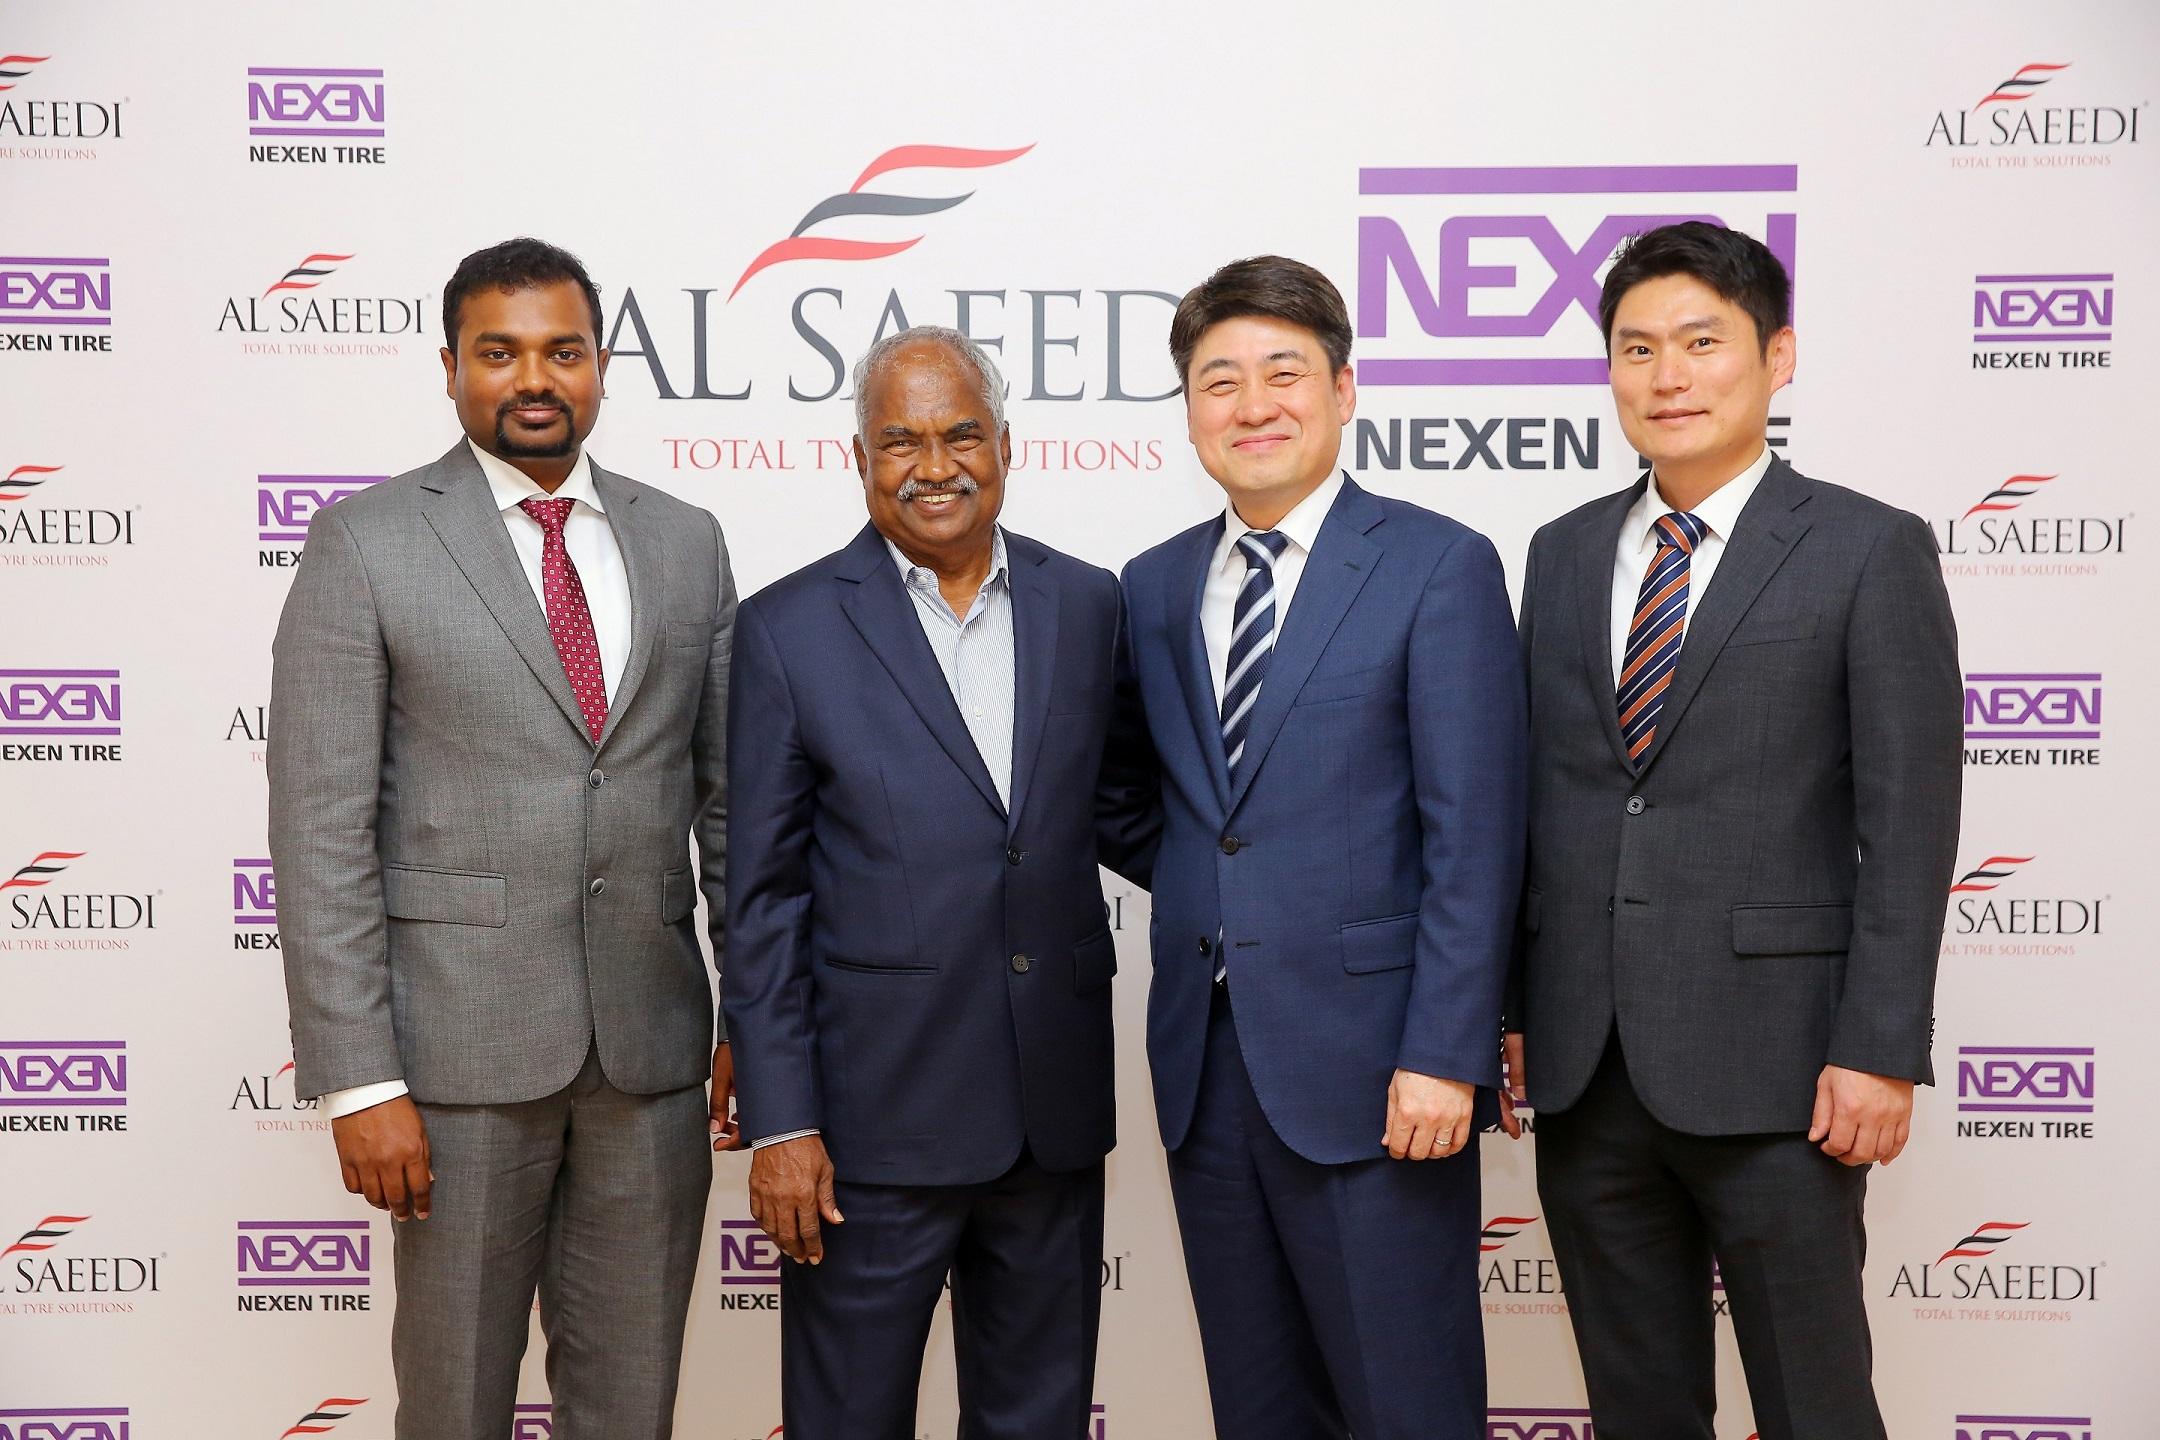 Nexen Tire partners with Al Saeedi Group